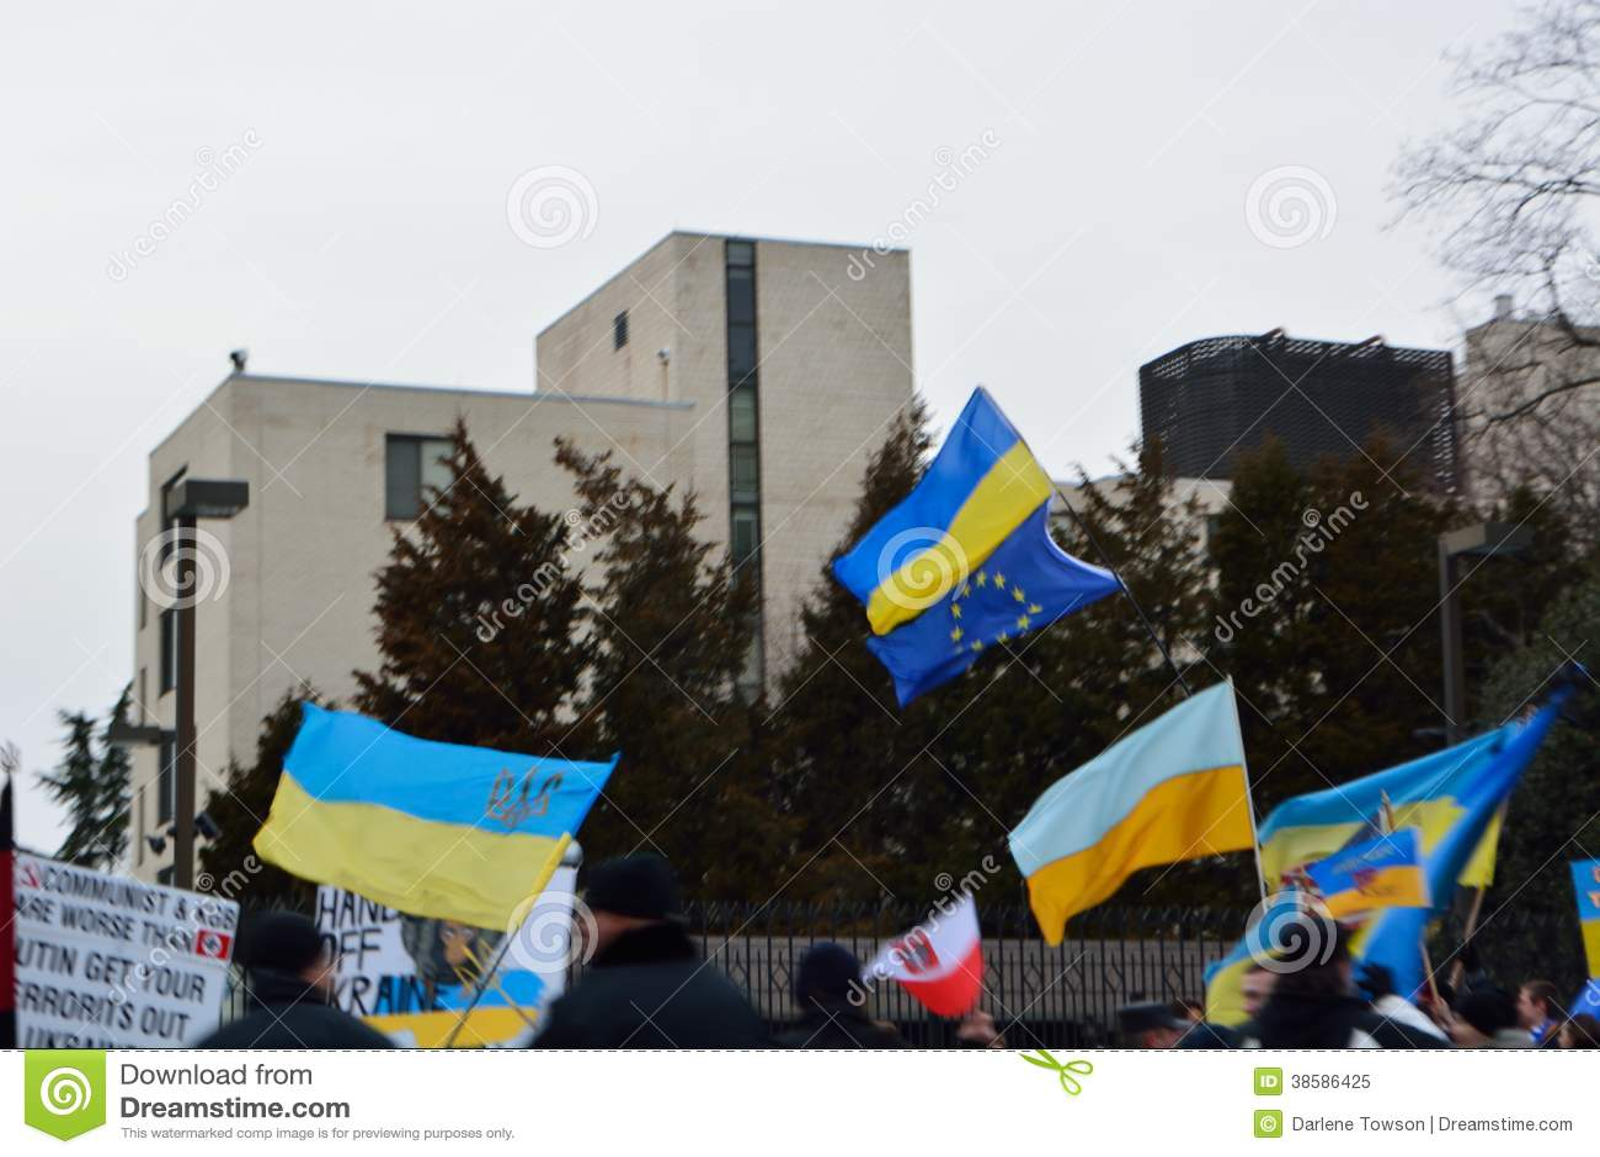 Putin Get your Terrorist out of Ukraine